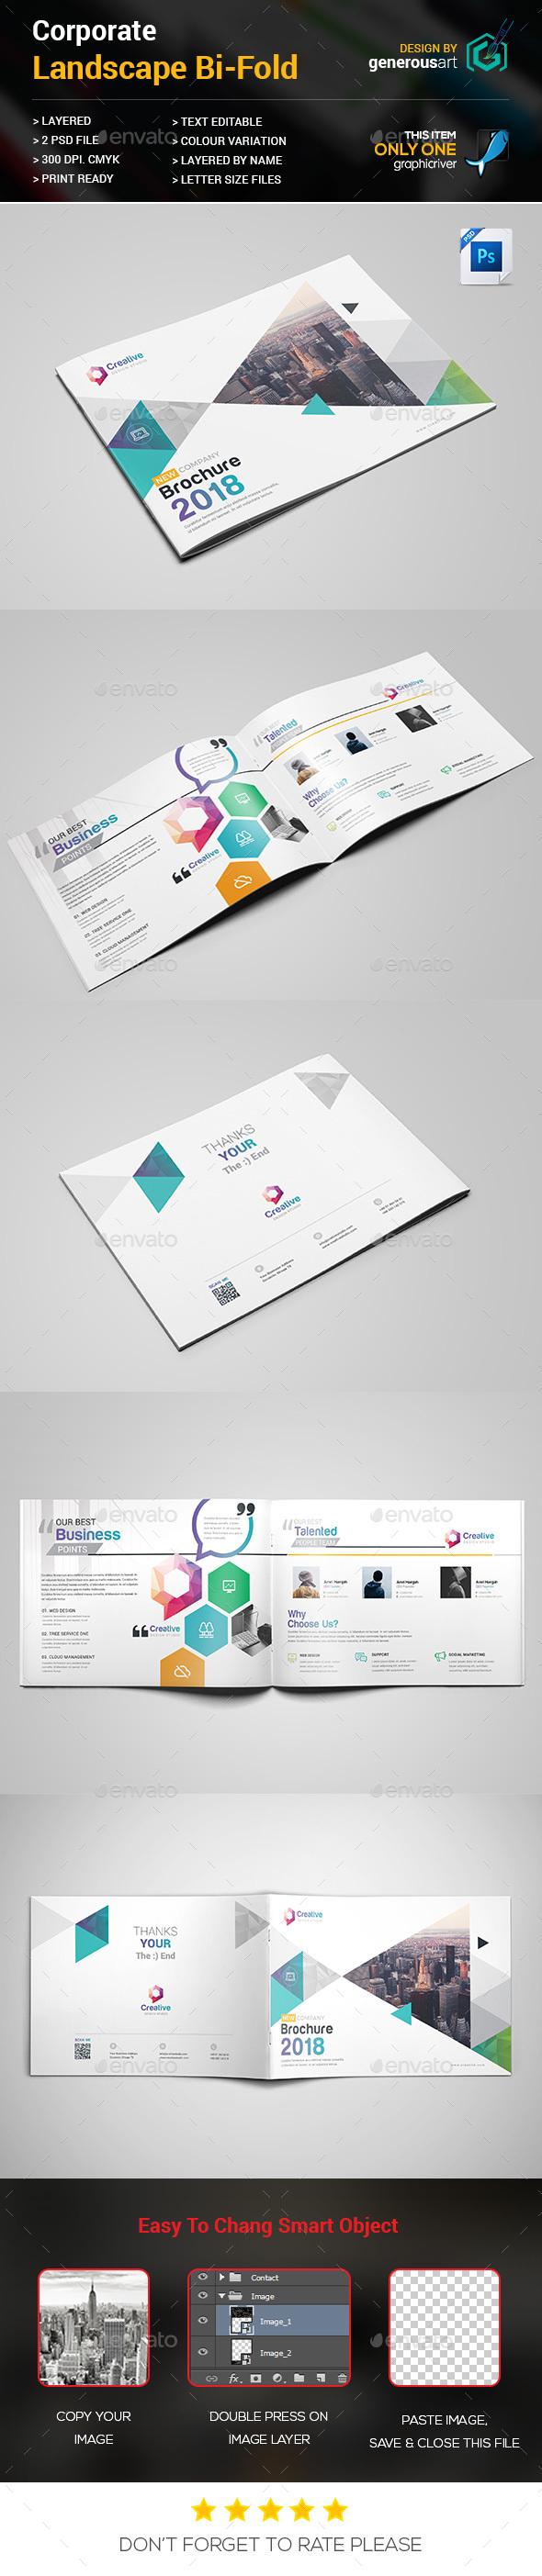 GraphicRiver Landscape Bi-Fold Template 20678614